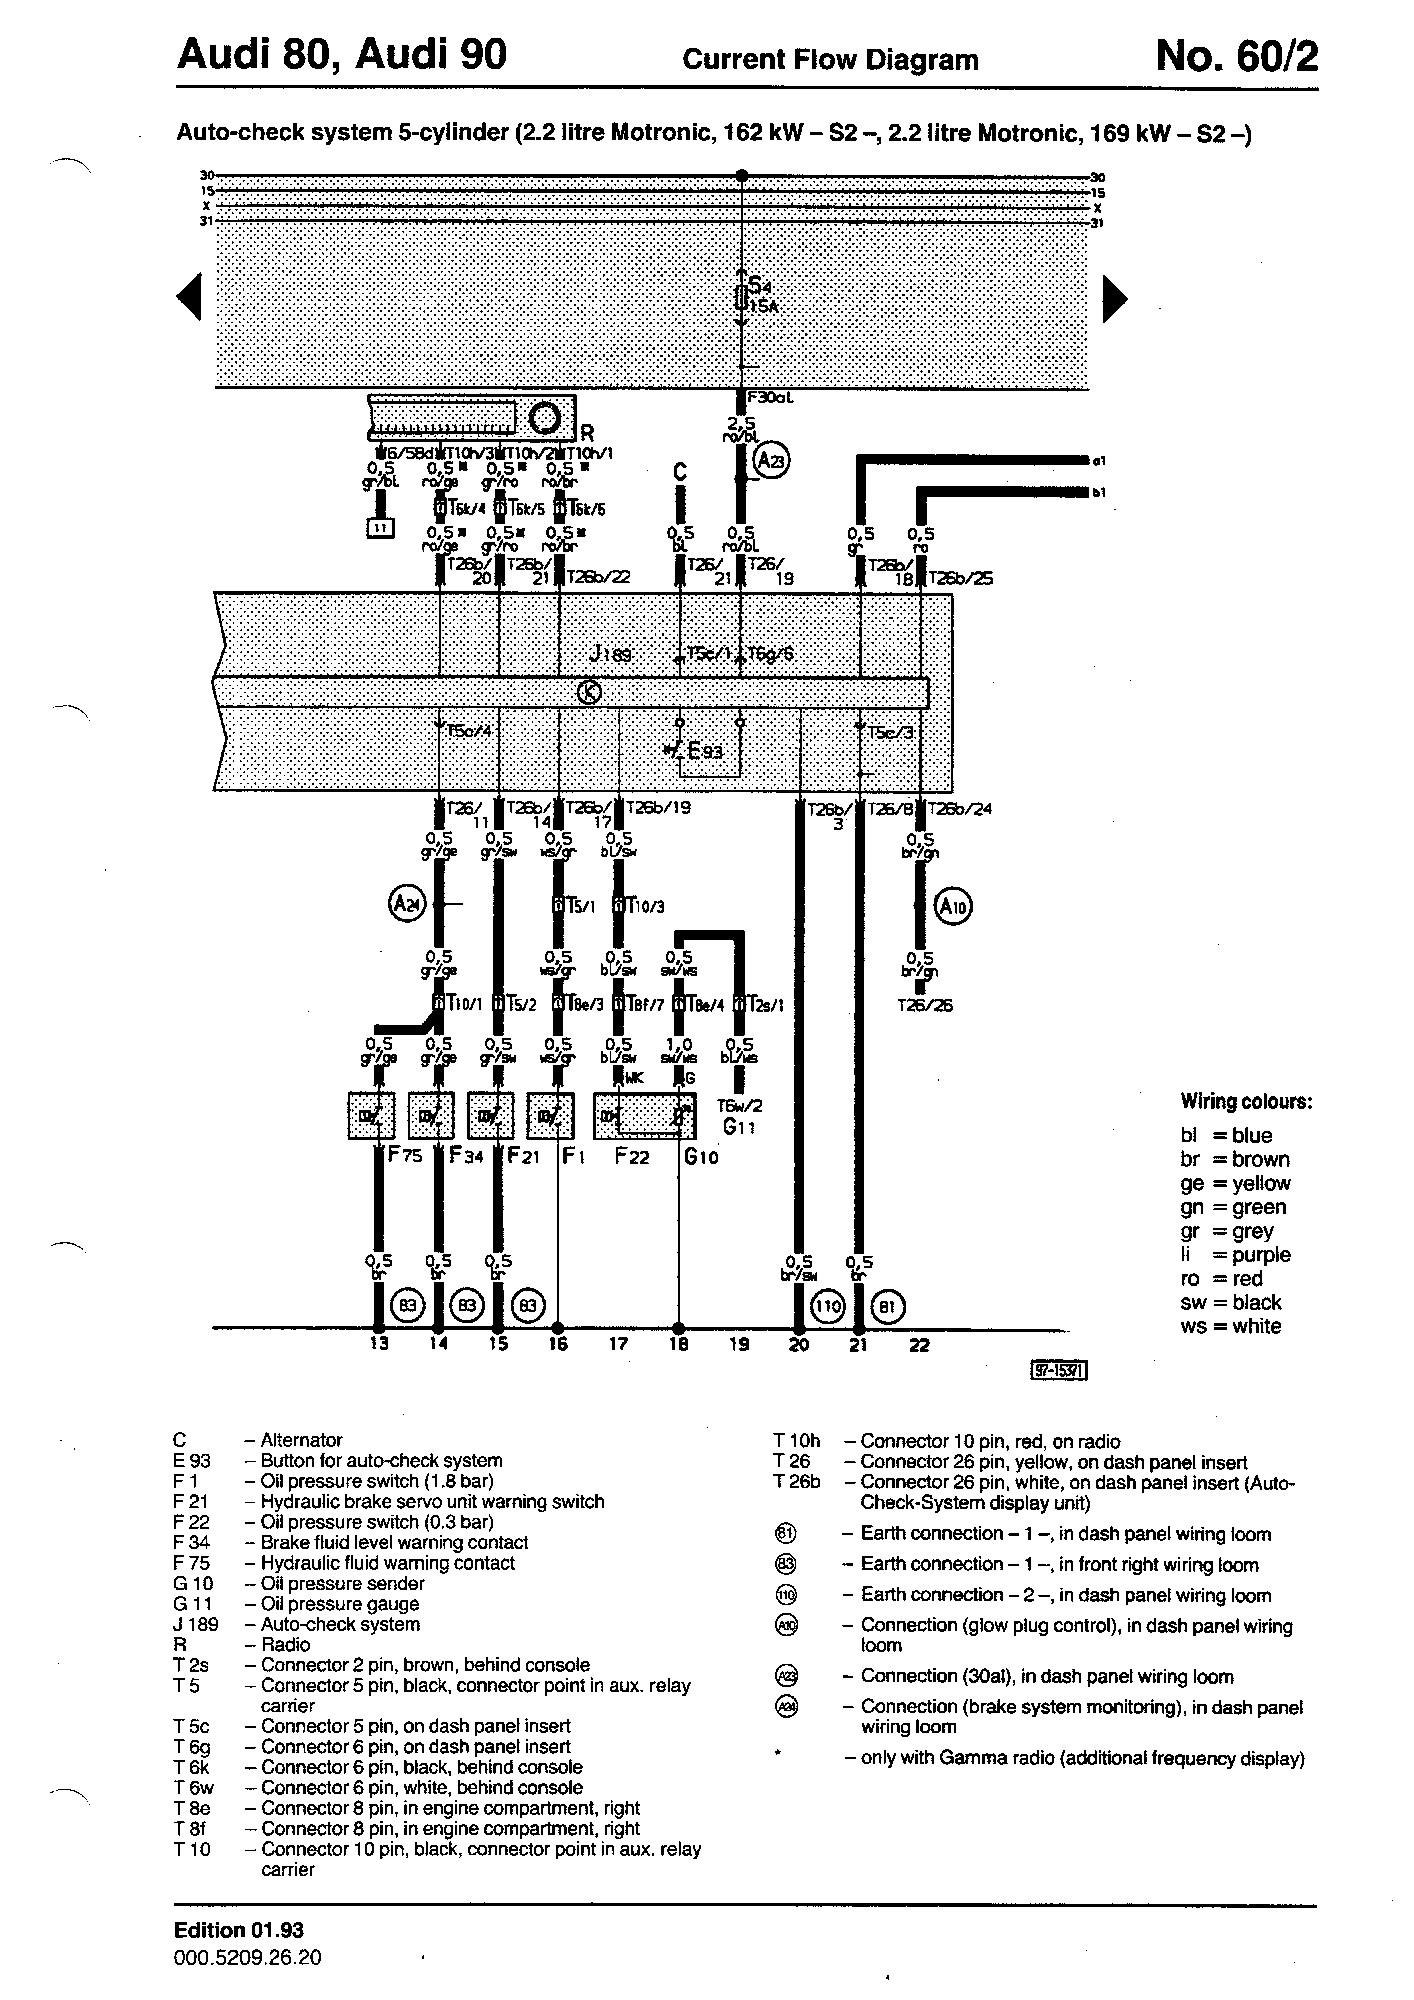 Oil Pressure Gauge Connection Diagram Ob 2945] Oil Pressure Sender Switch Schematic Wiring Diagram Of Oil Pressure Gauge Connection Diagram